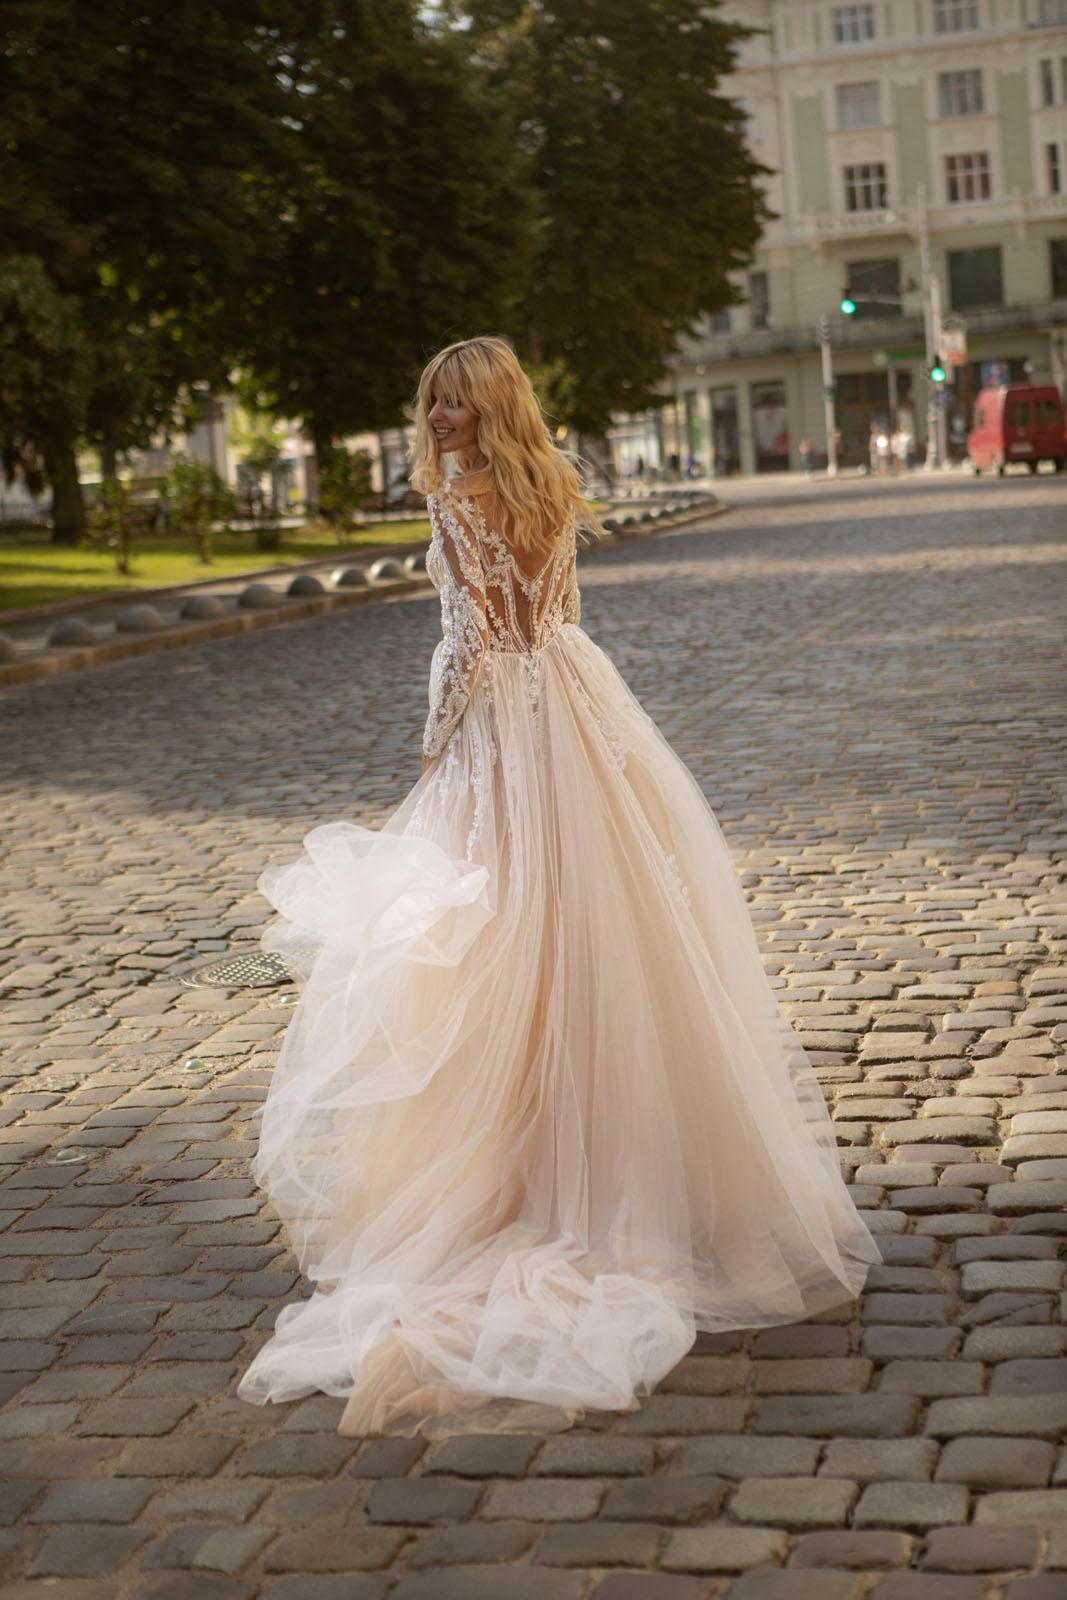 TRASY-Oksana Mukha - Suknie ślubne